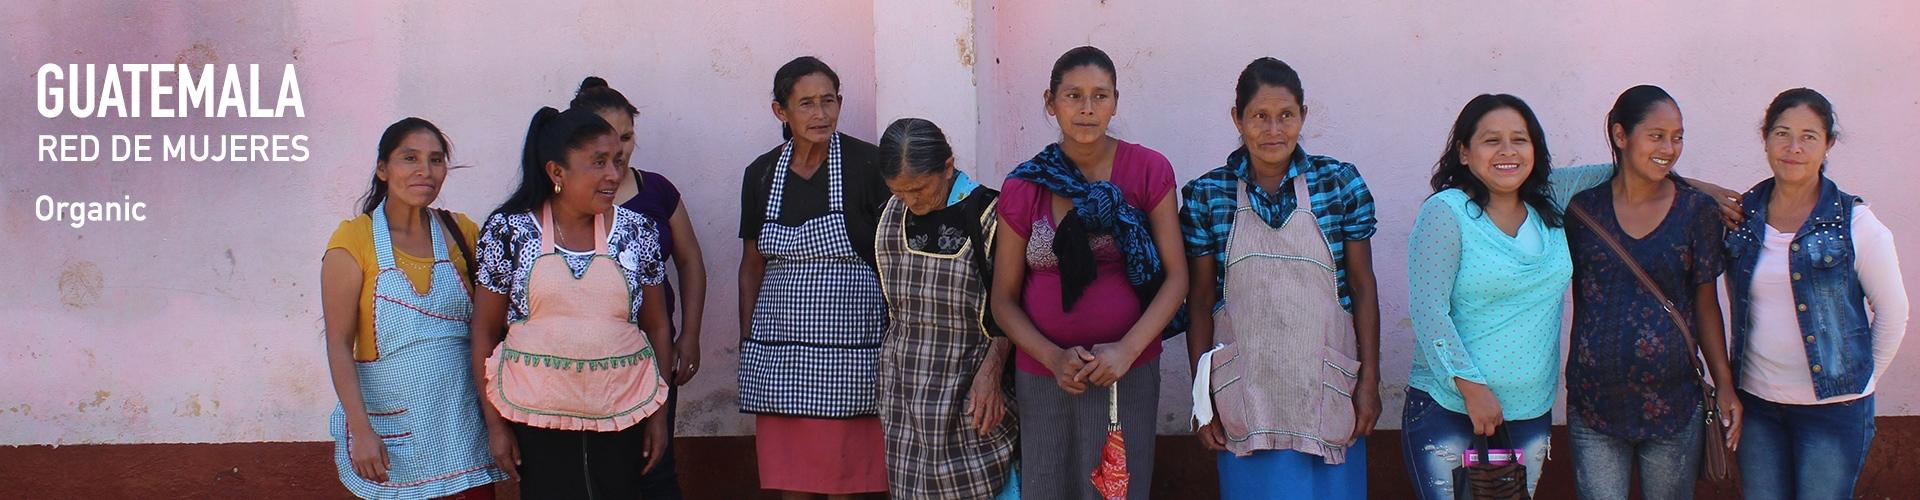 Guatemala Red de Mujeres